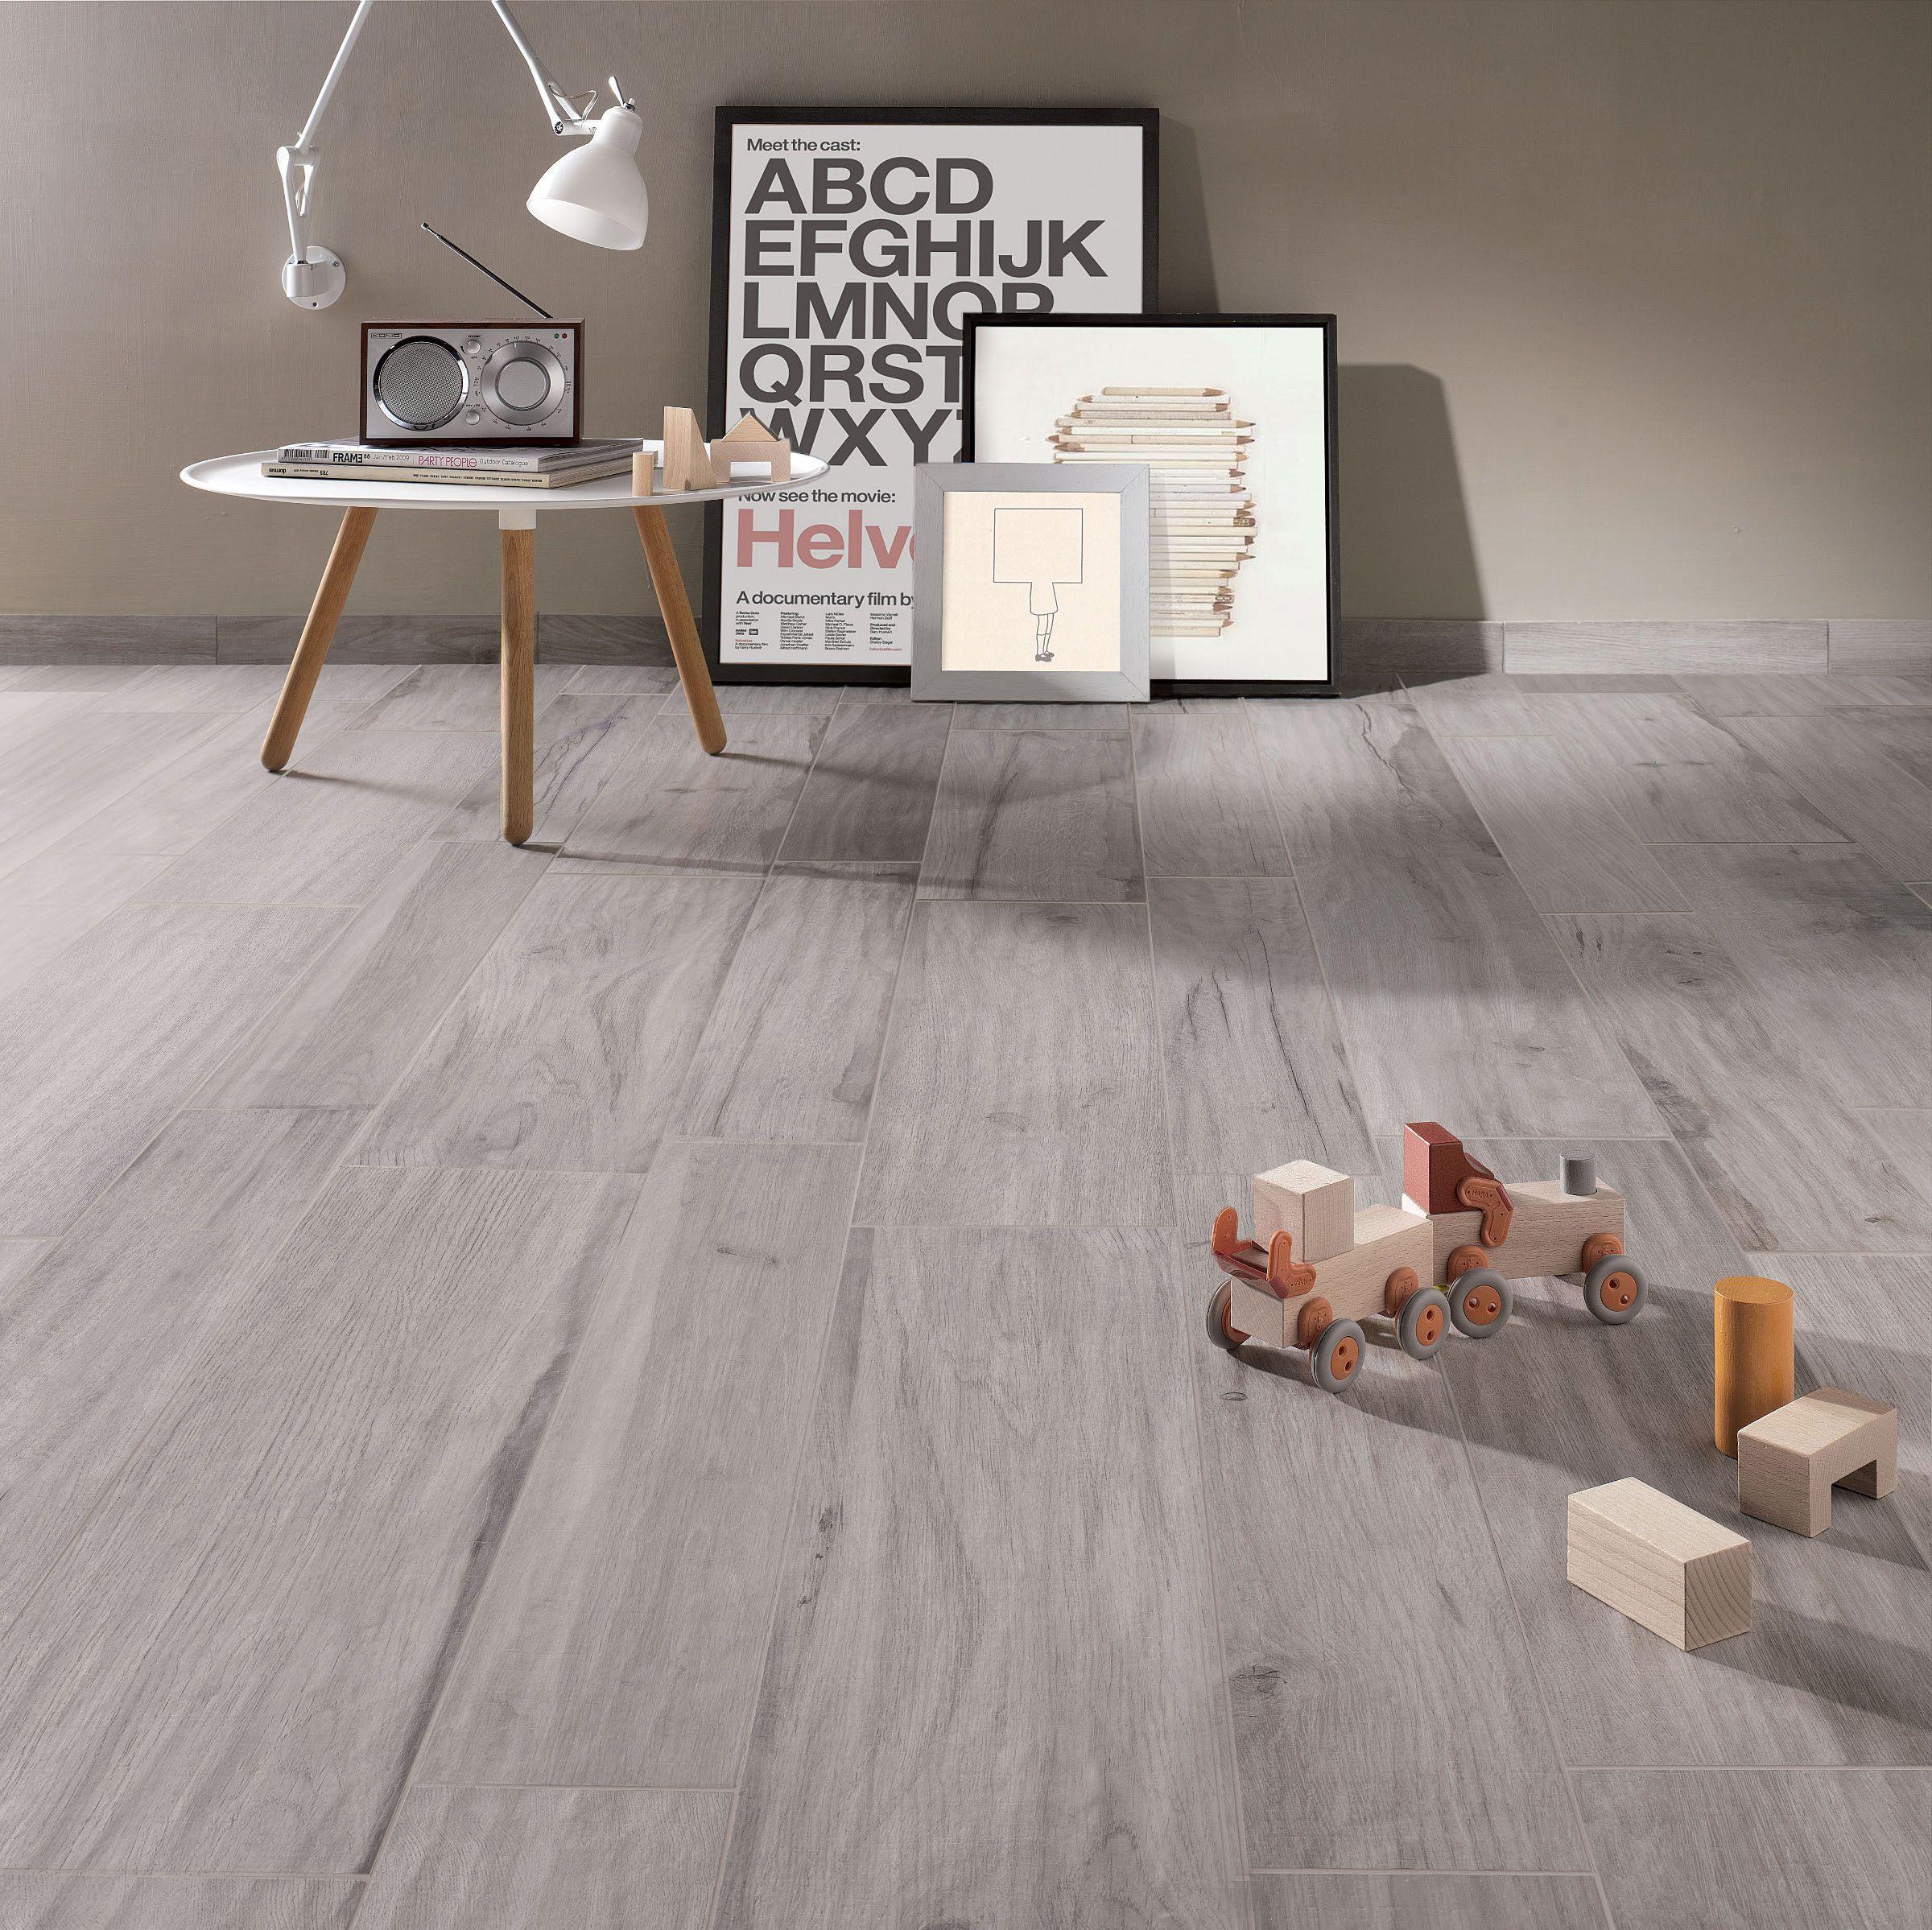 Wall Floor Tiles With Wood Effect Grey Wood Love Love Love Wall And Floor Tiles Living Room Tiles Tile Floor Living Room